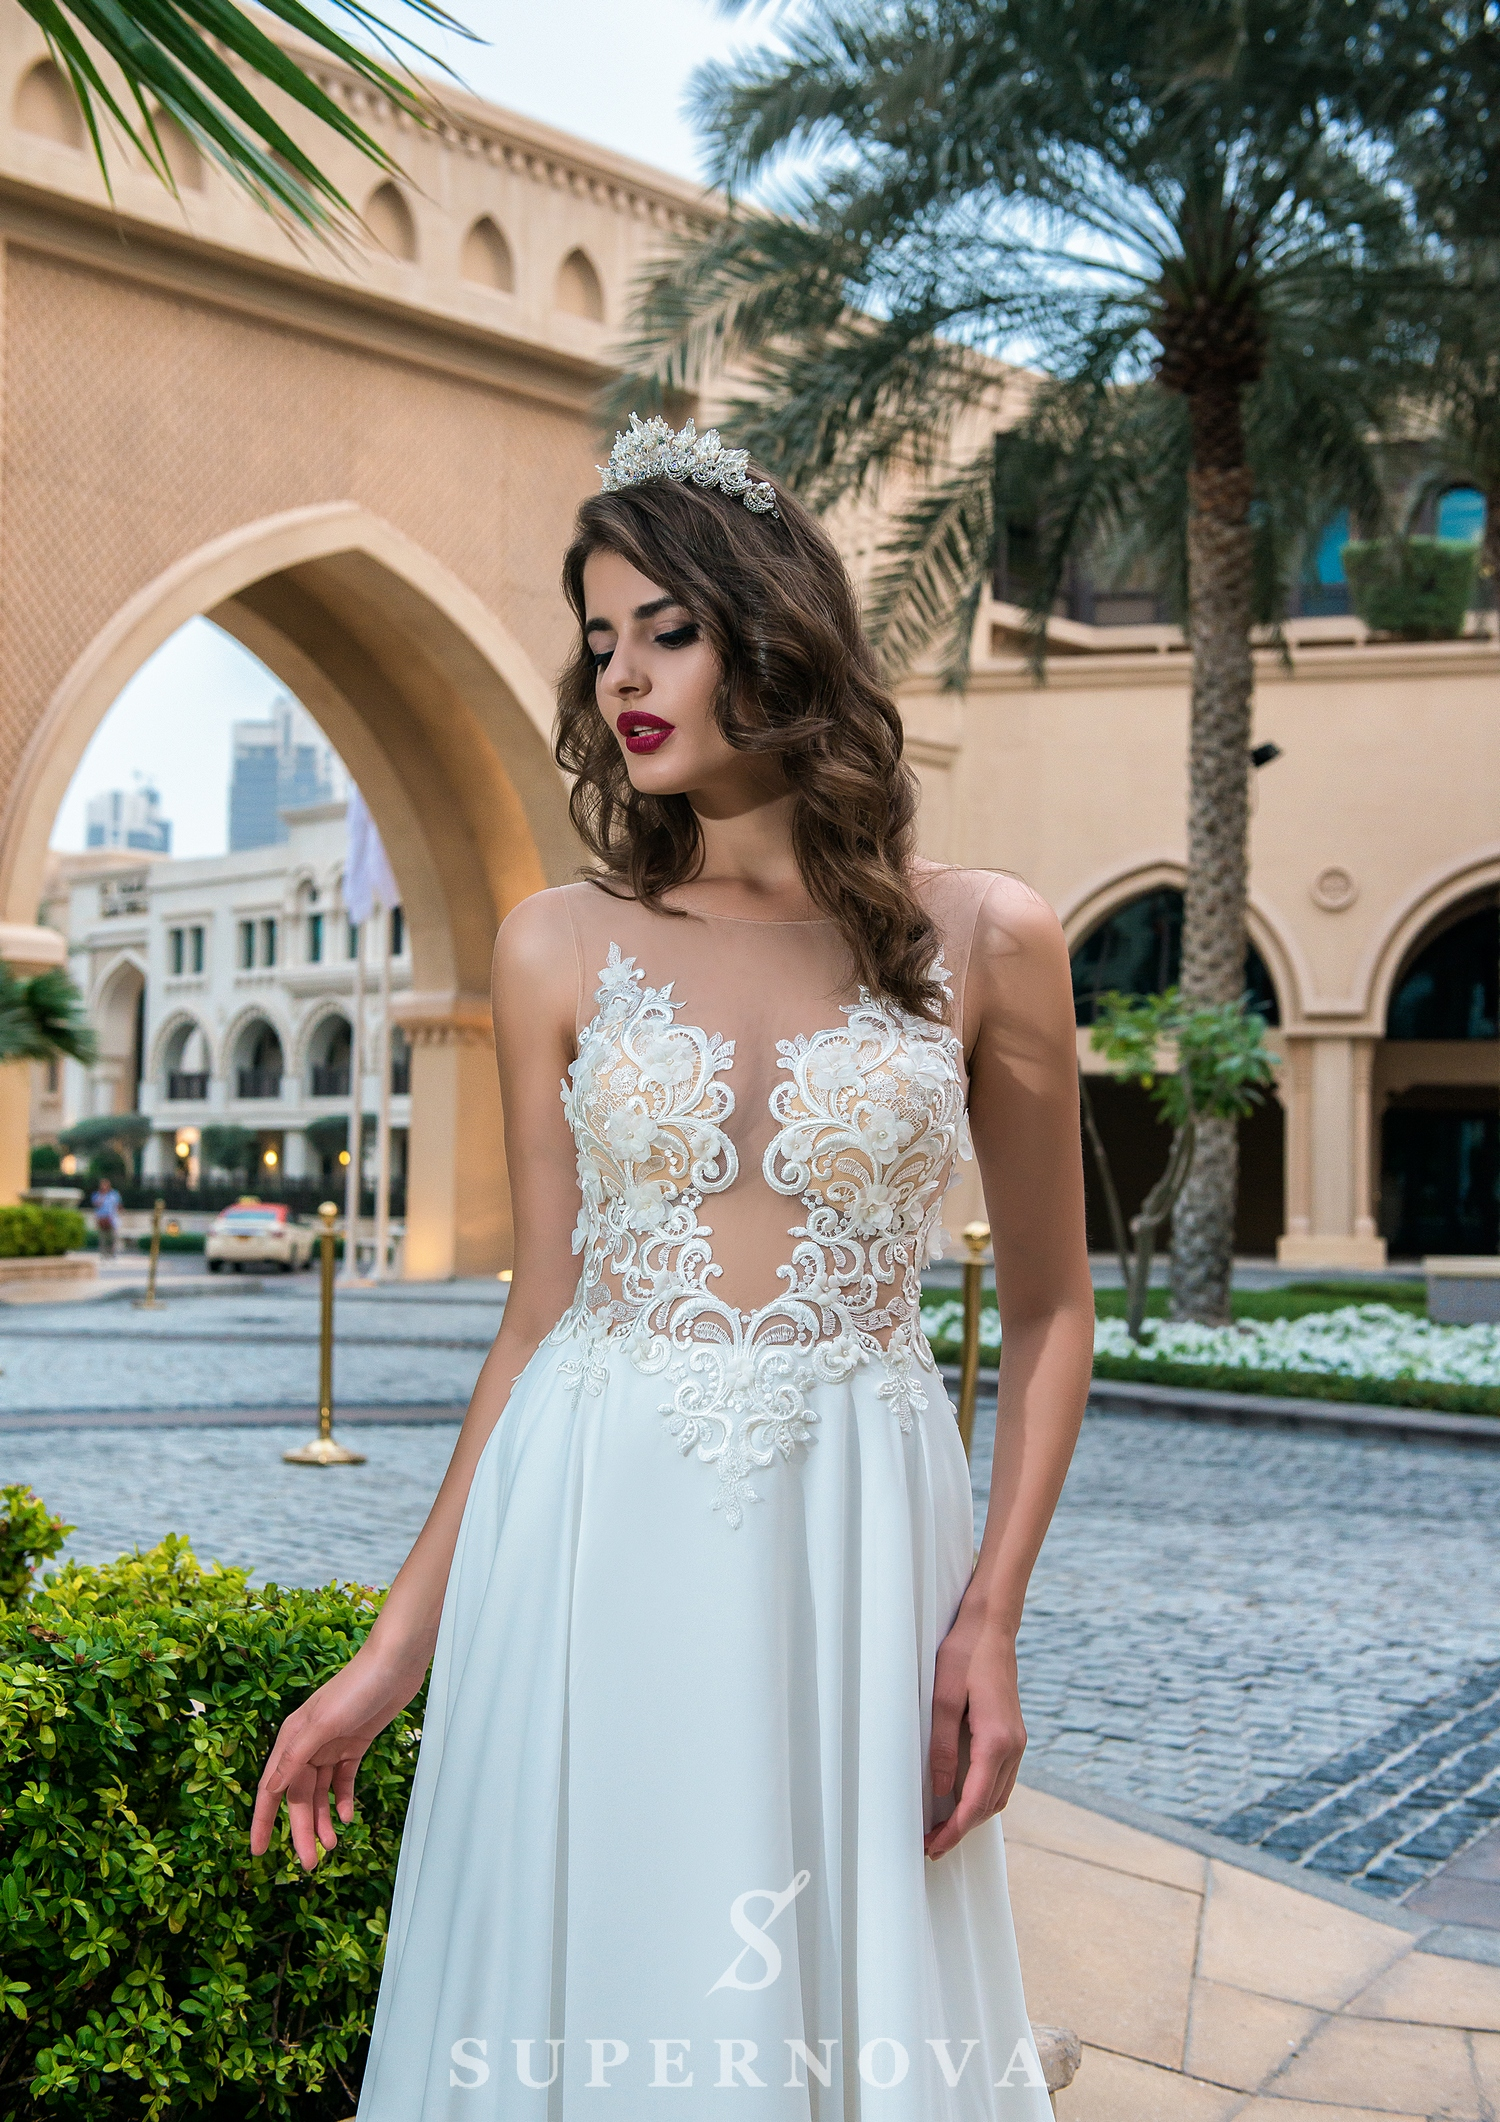 Euro mesh wedding dress-1